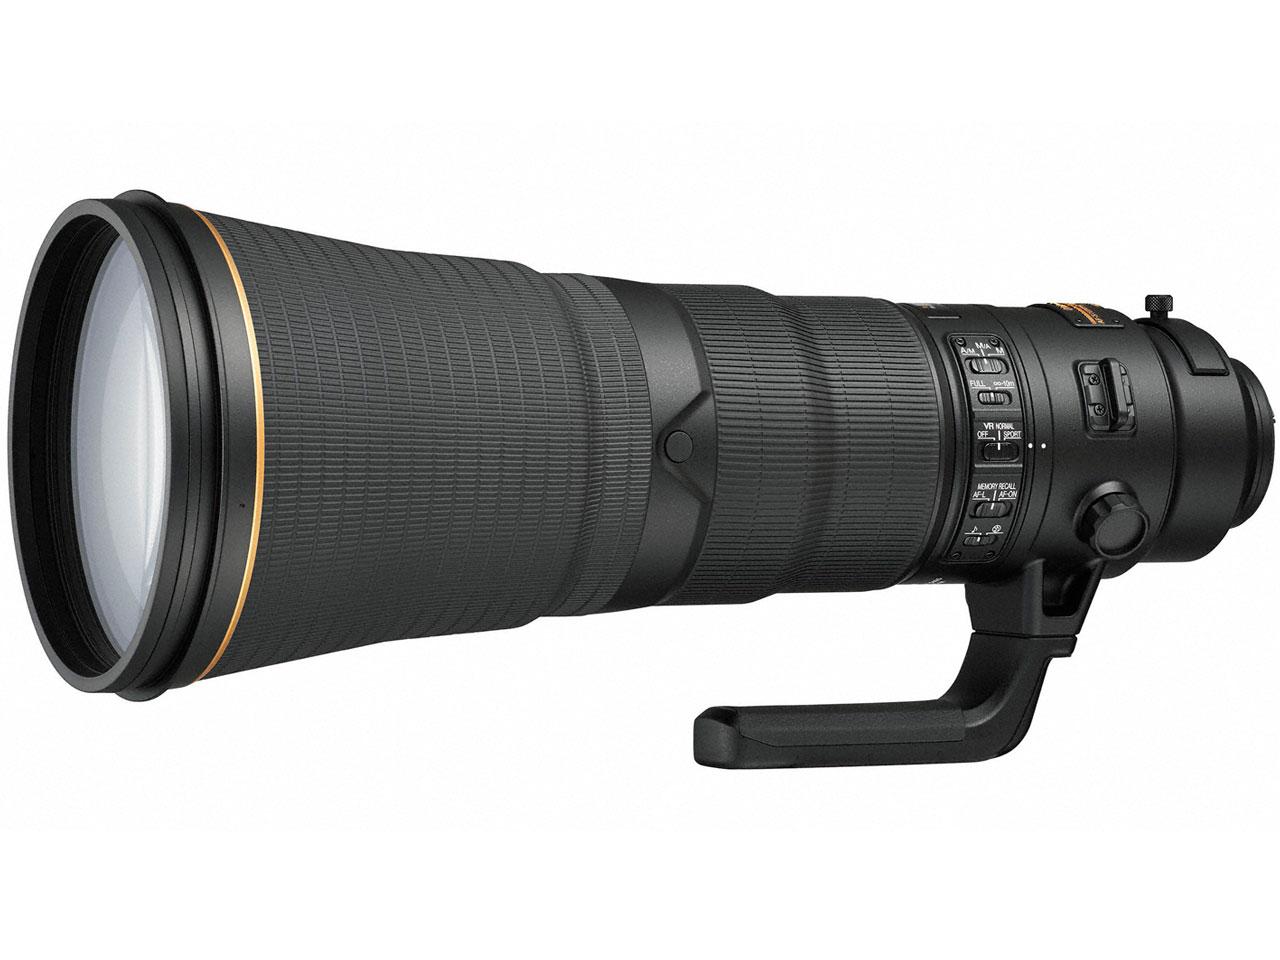 ニコン AF-S NIKKOR 600mm f/4E FL ED VR